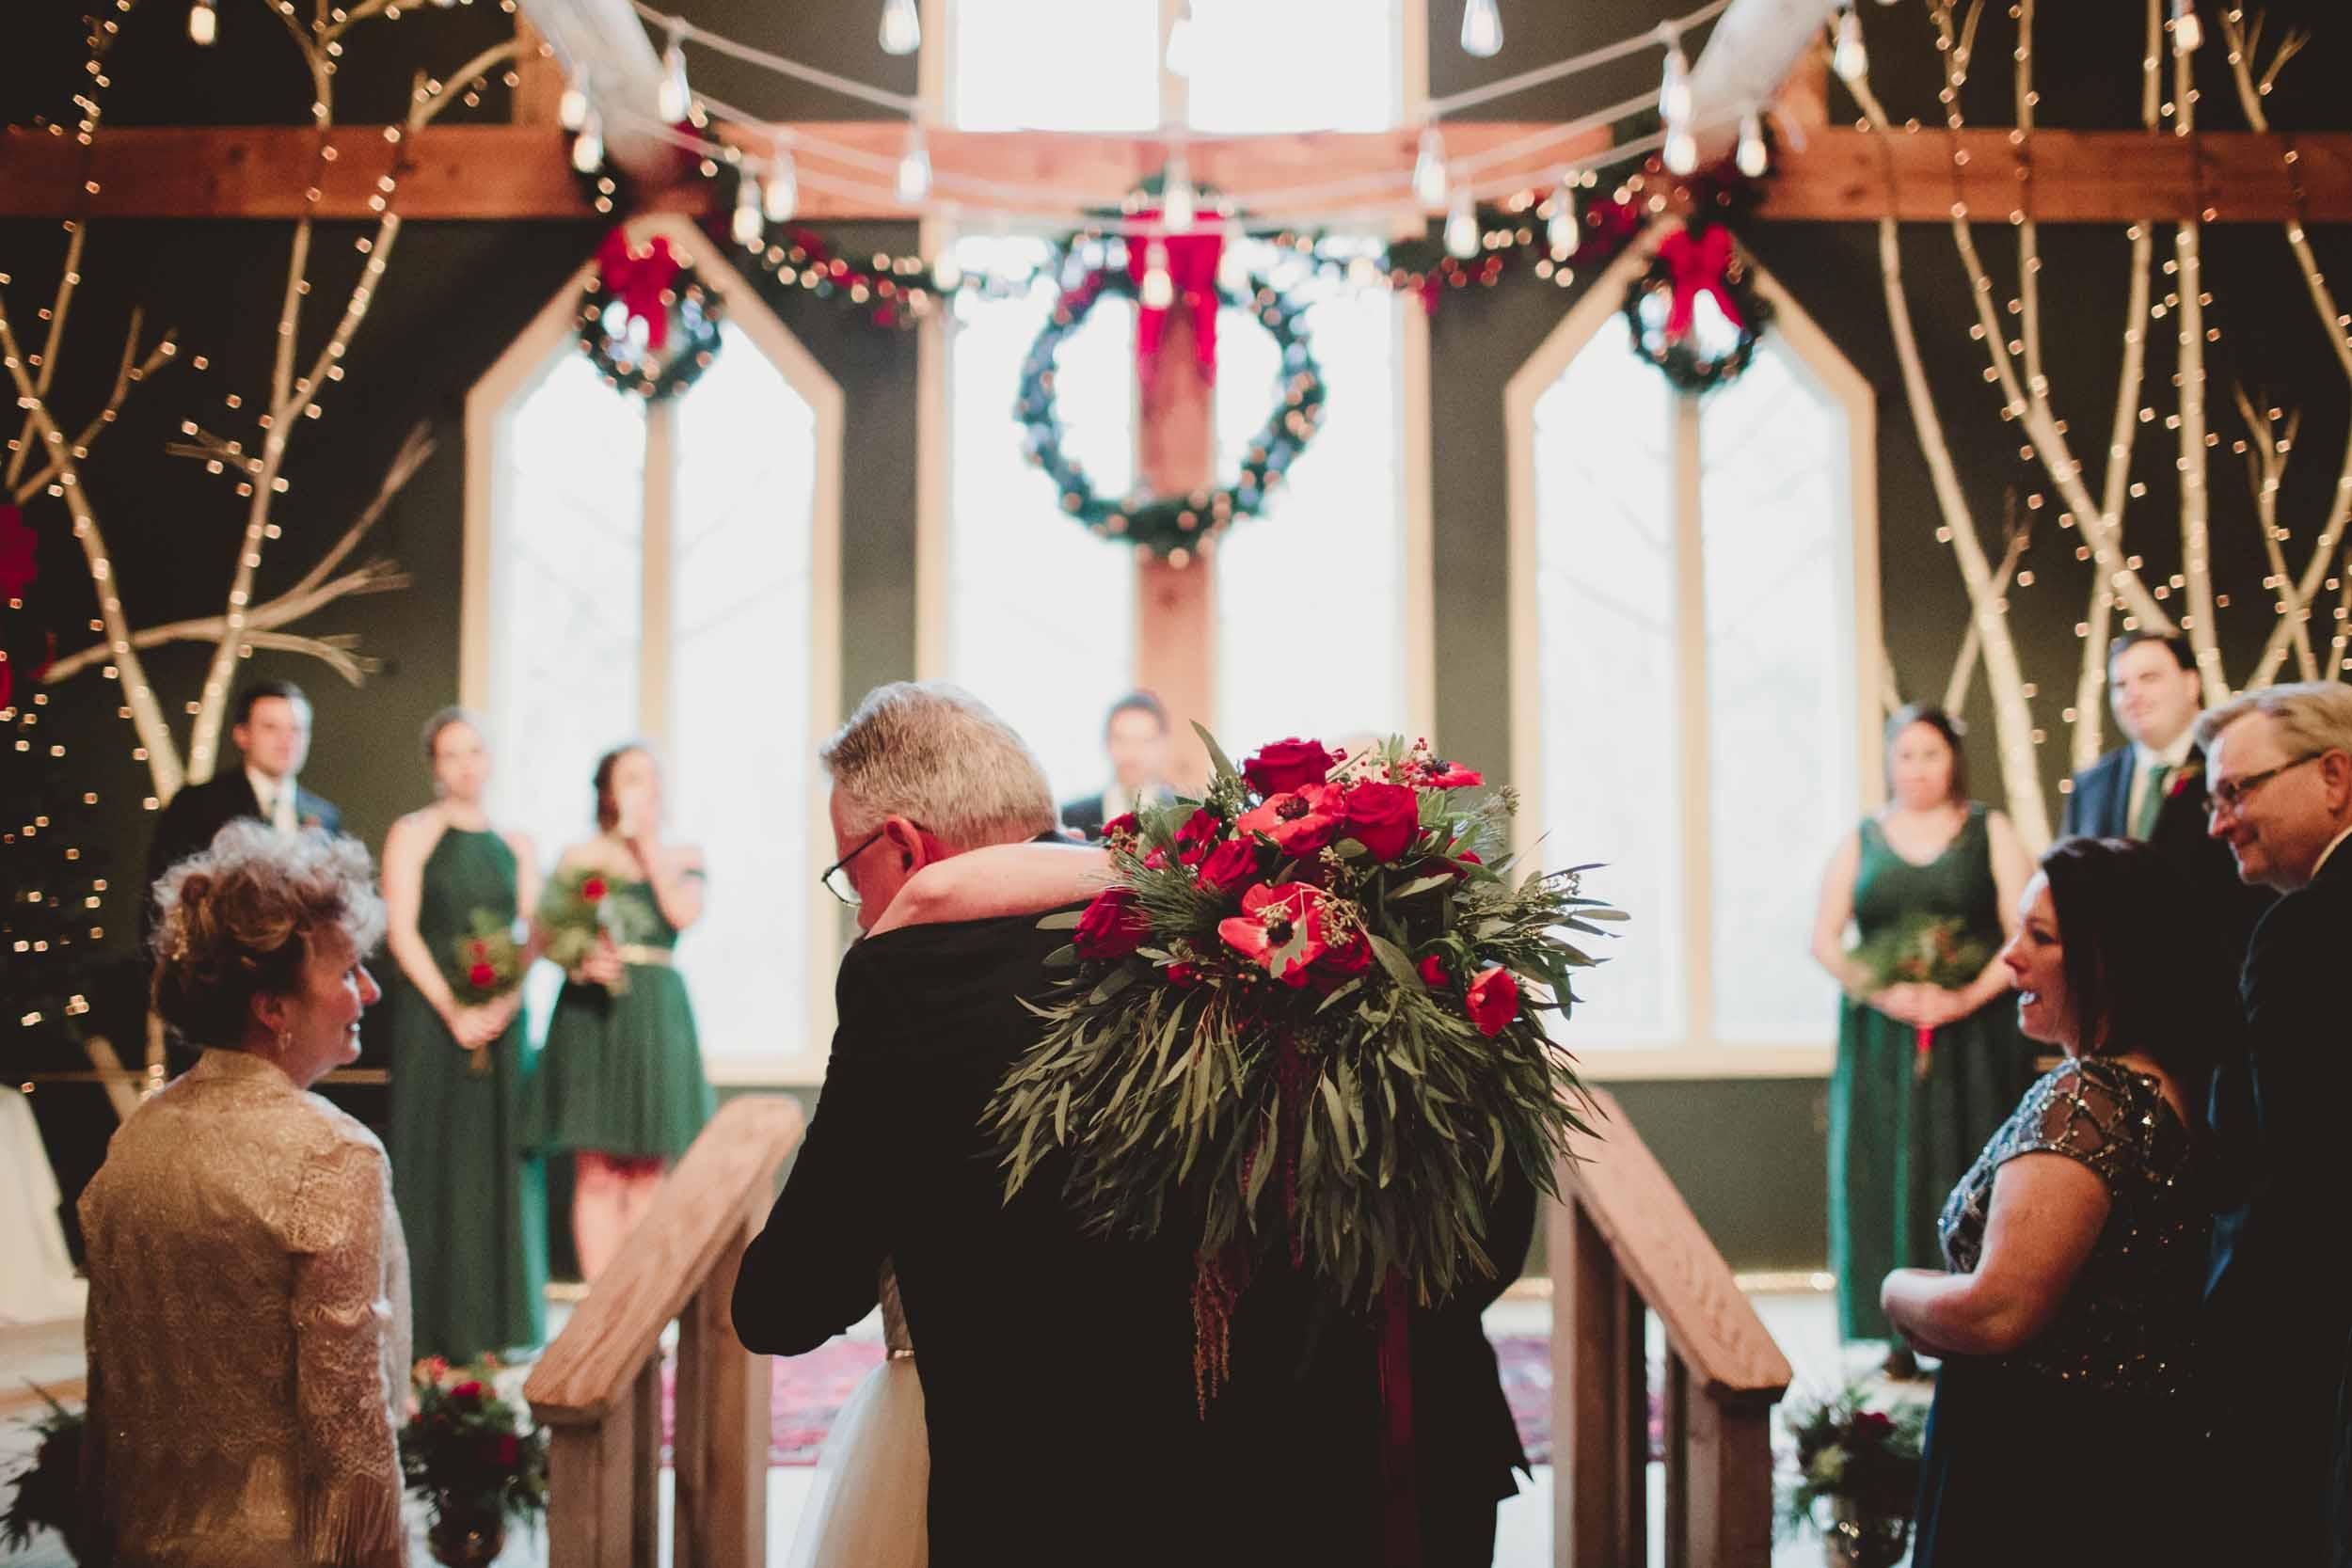 Stone-mountain-arts-wedding45.jpg